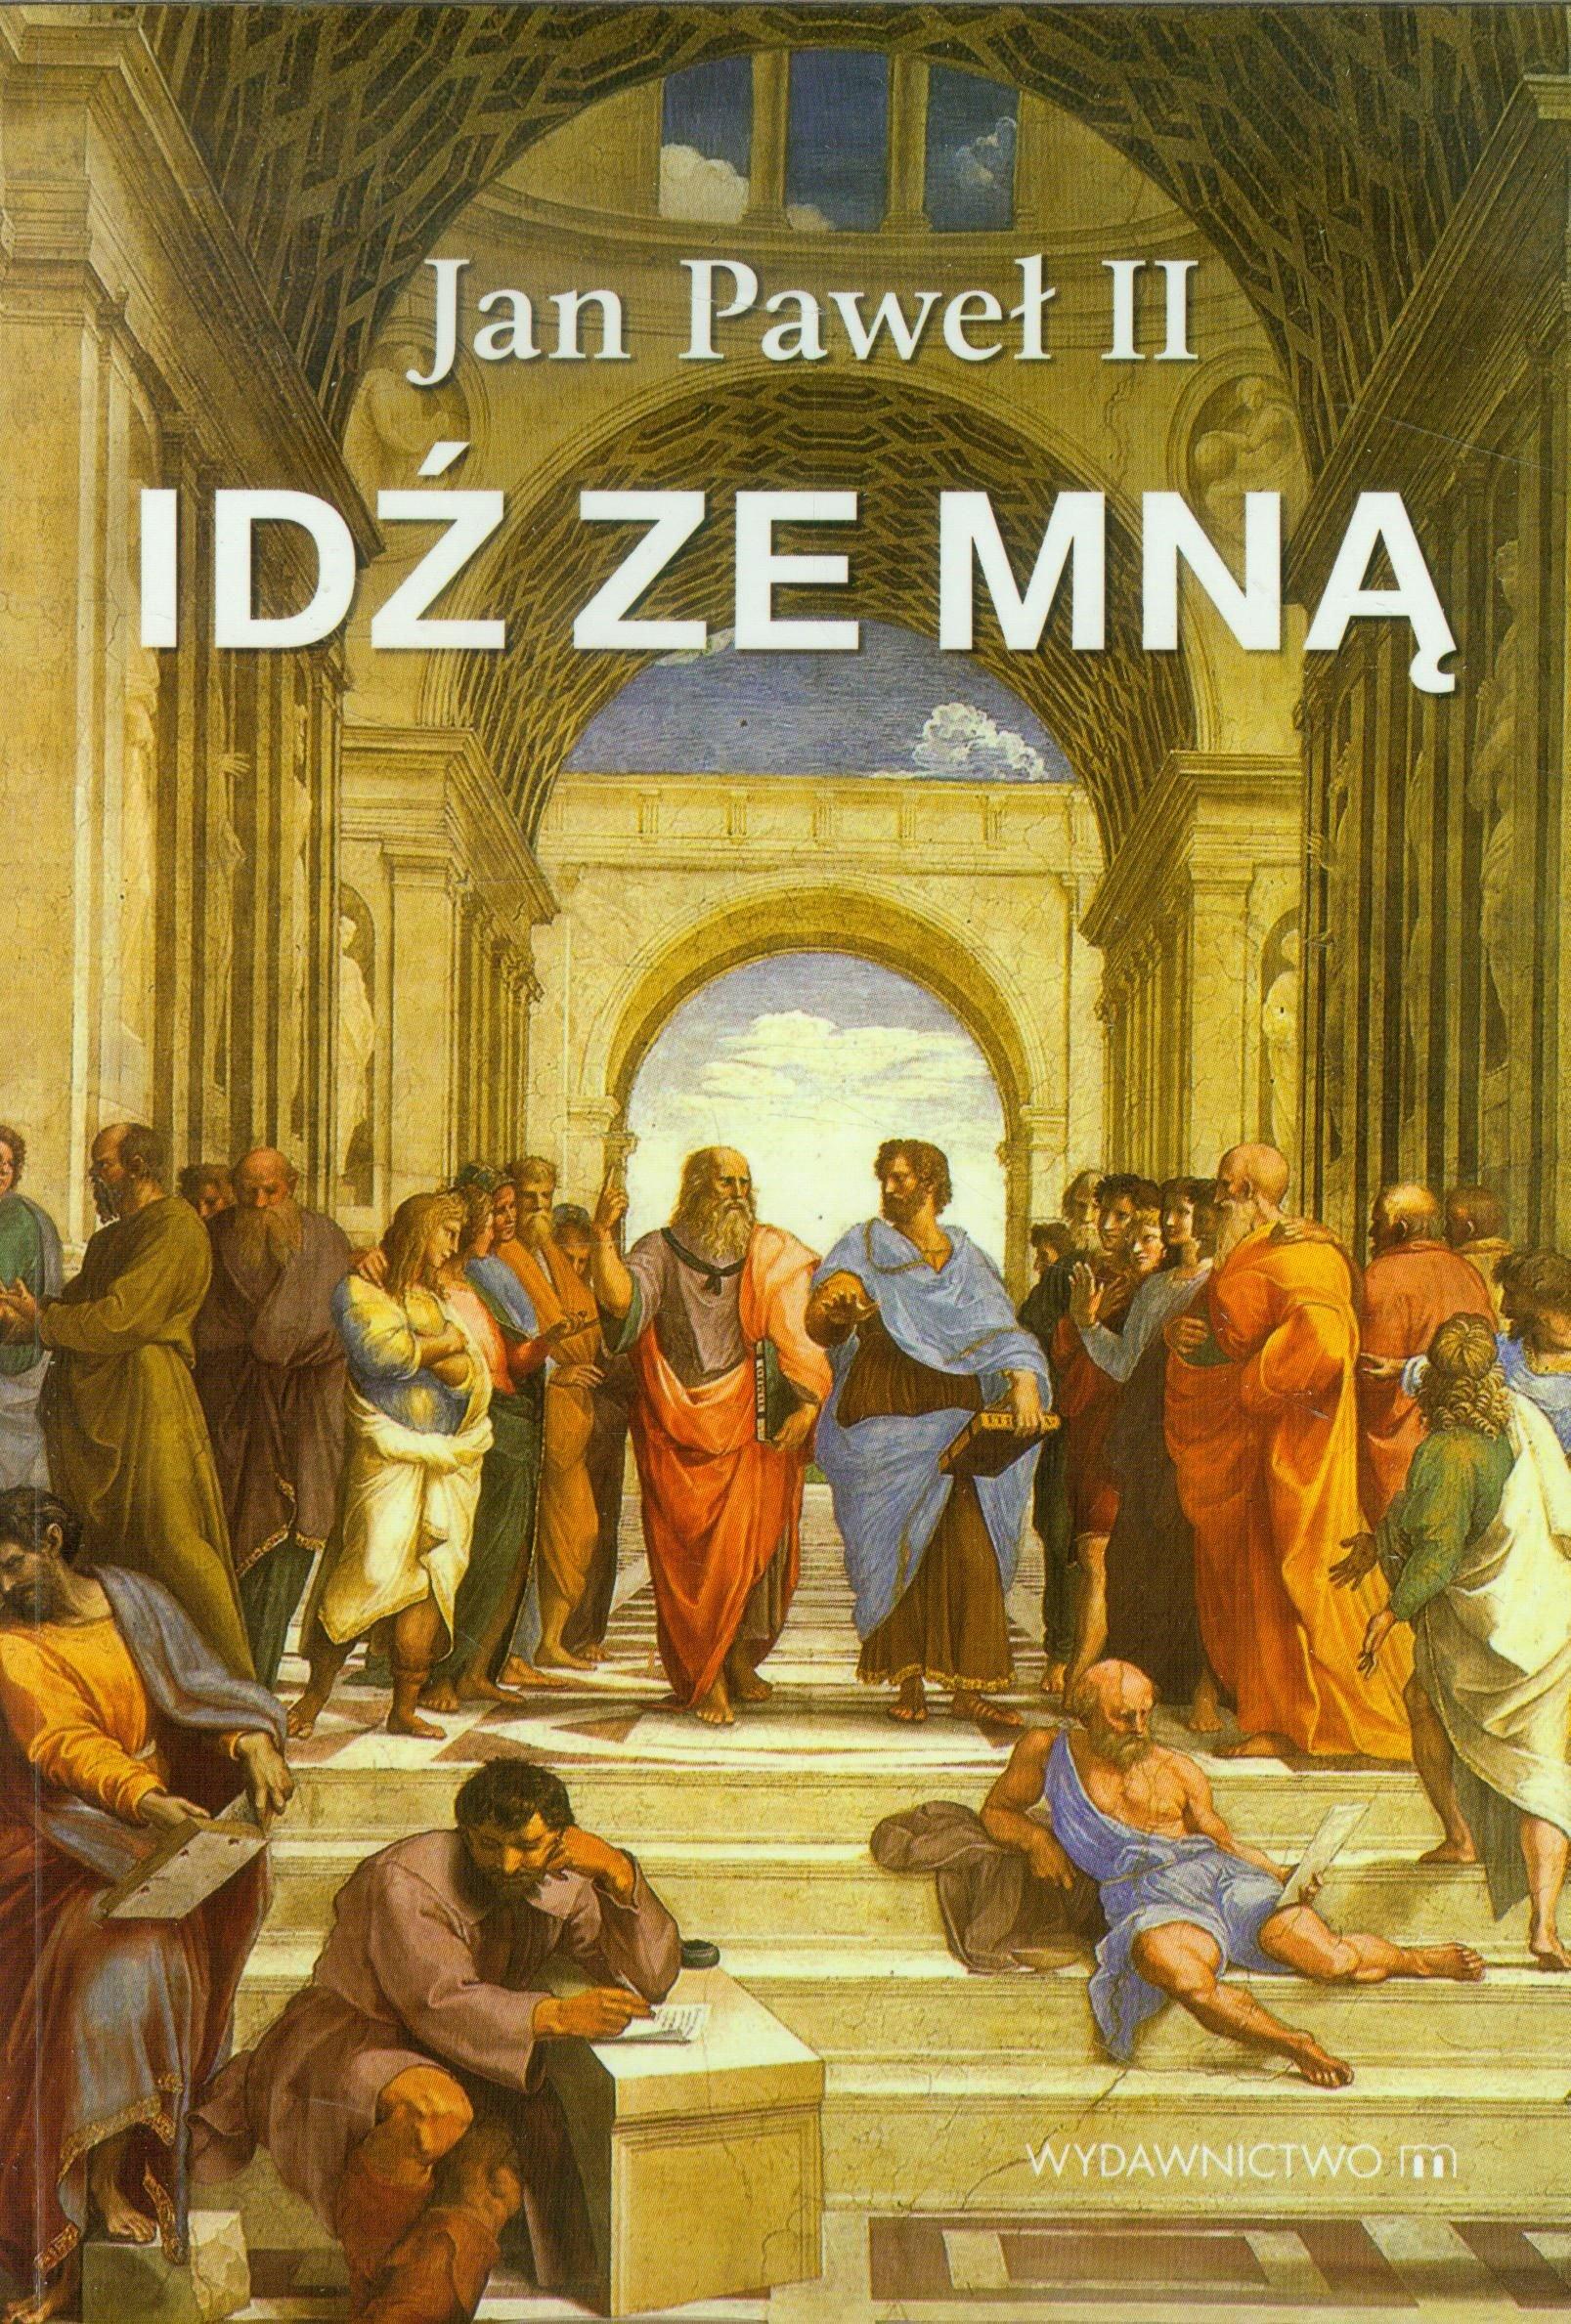 Idz Ze Mna Amazones Pawel Ii Jan Libros En Idiomas